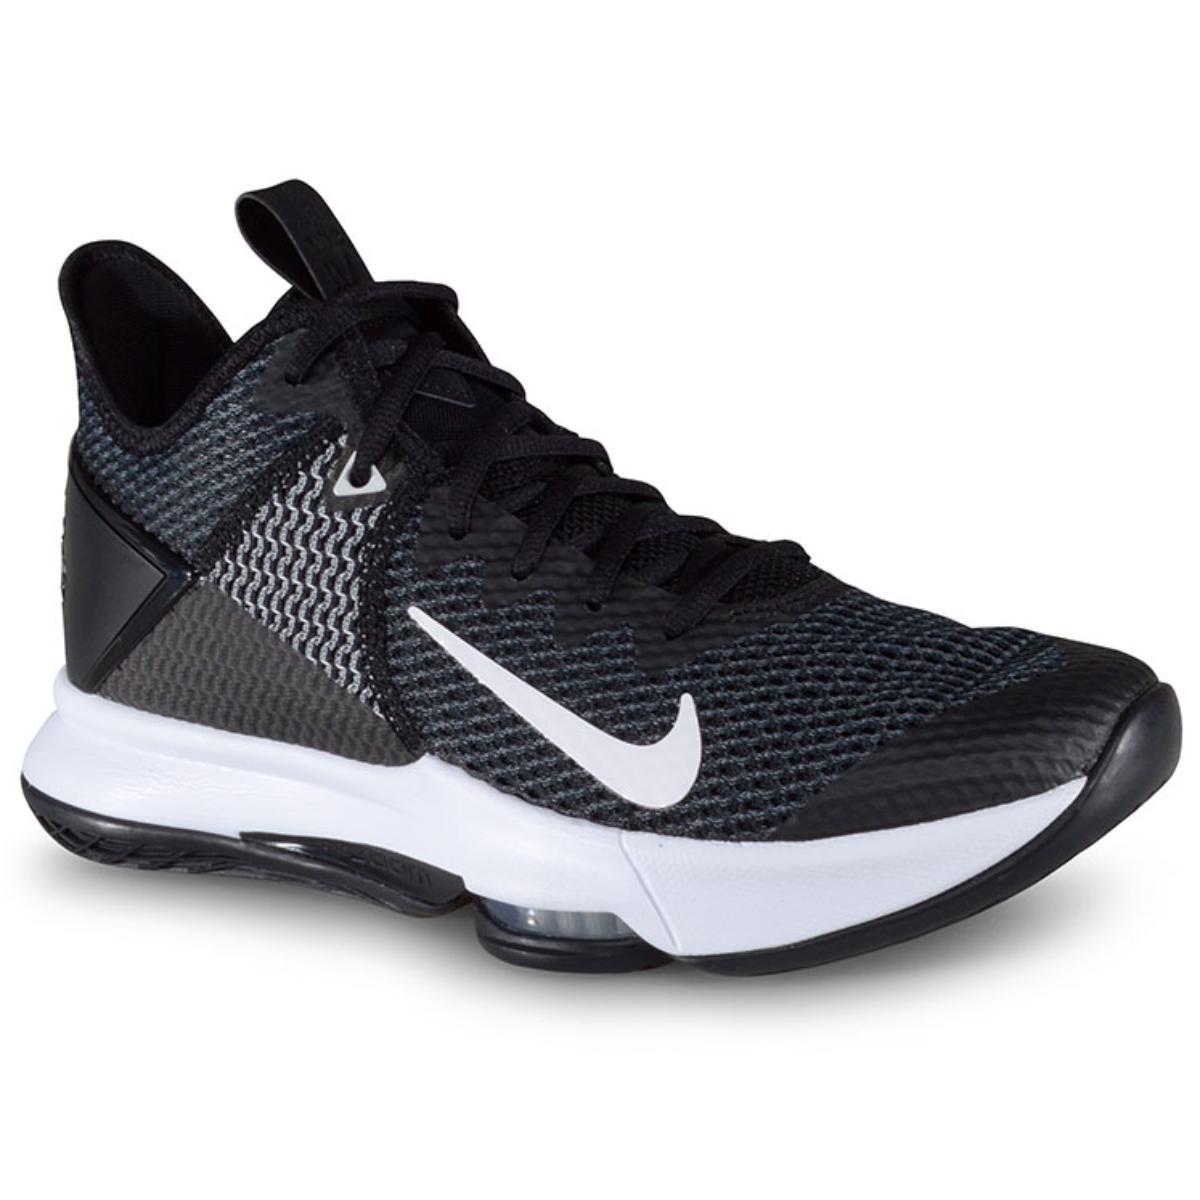 Tênis Masculino Nike Bv7427-001 Lebron Witness iv Preto/branco